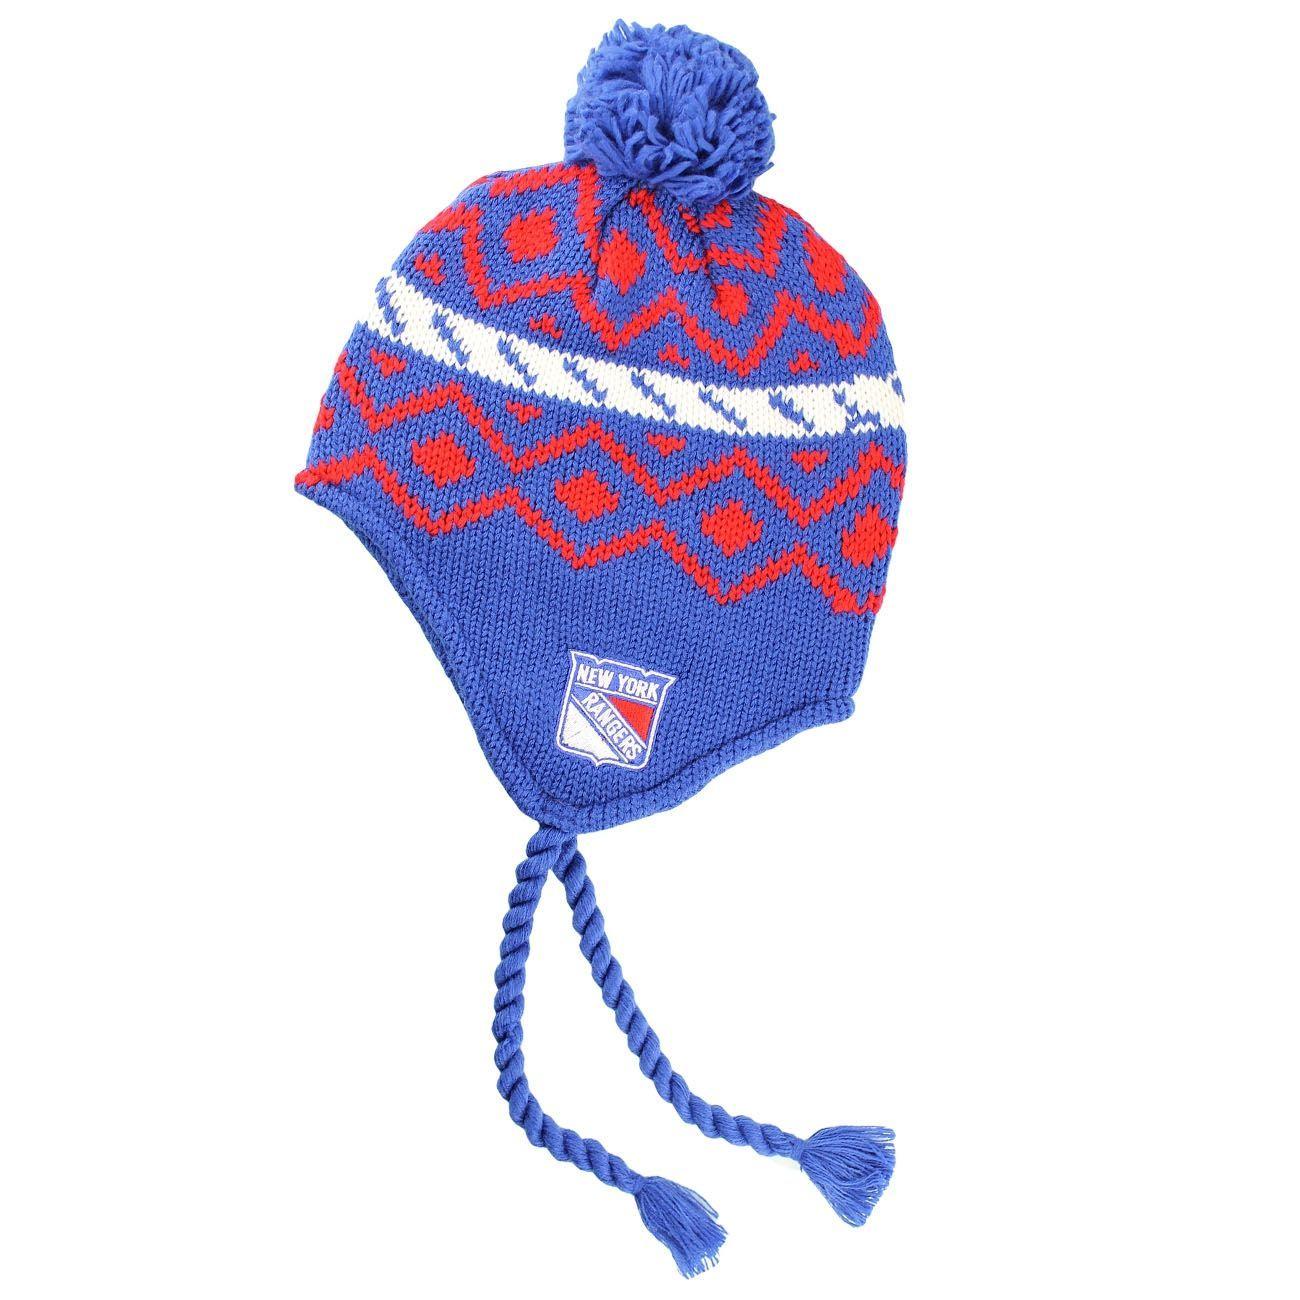 a3c257ba4e5 Reebok New York Rangers Tassle NHL Knit Hat  w Pom